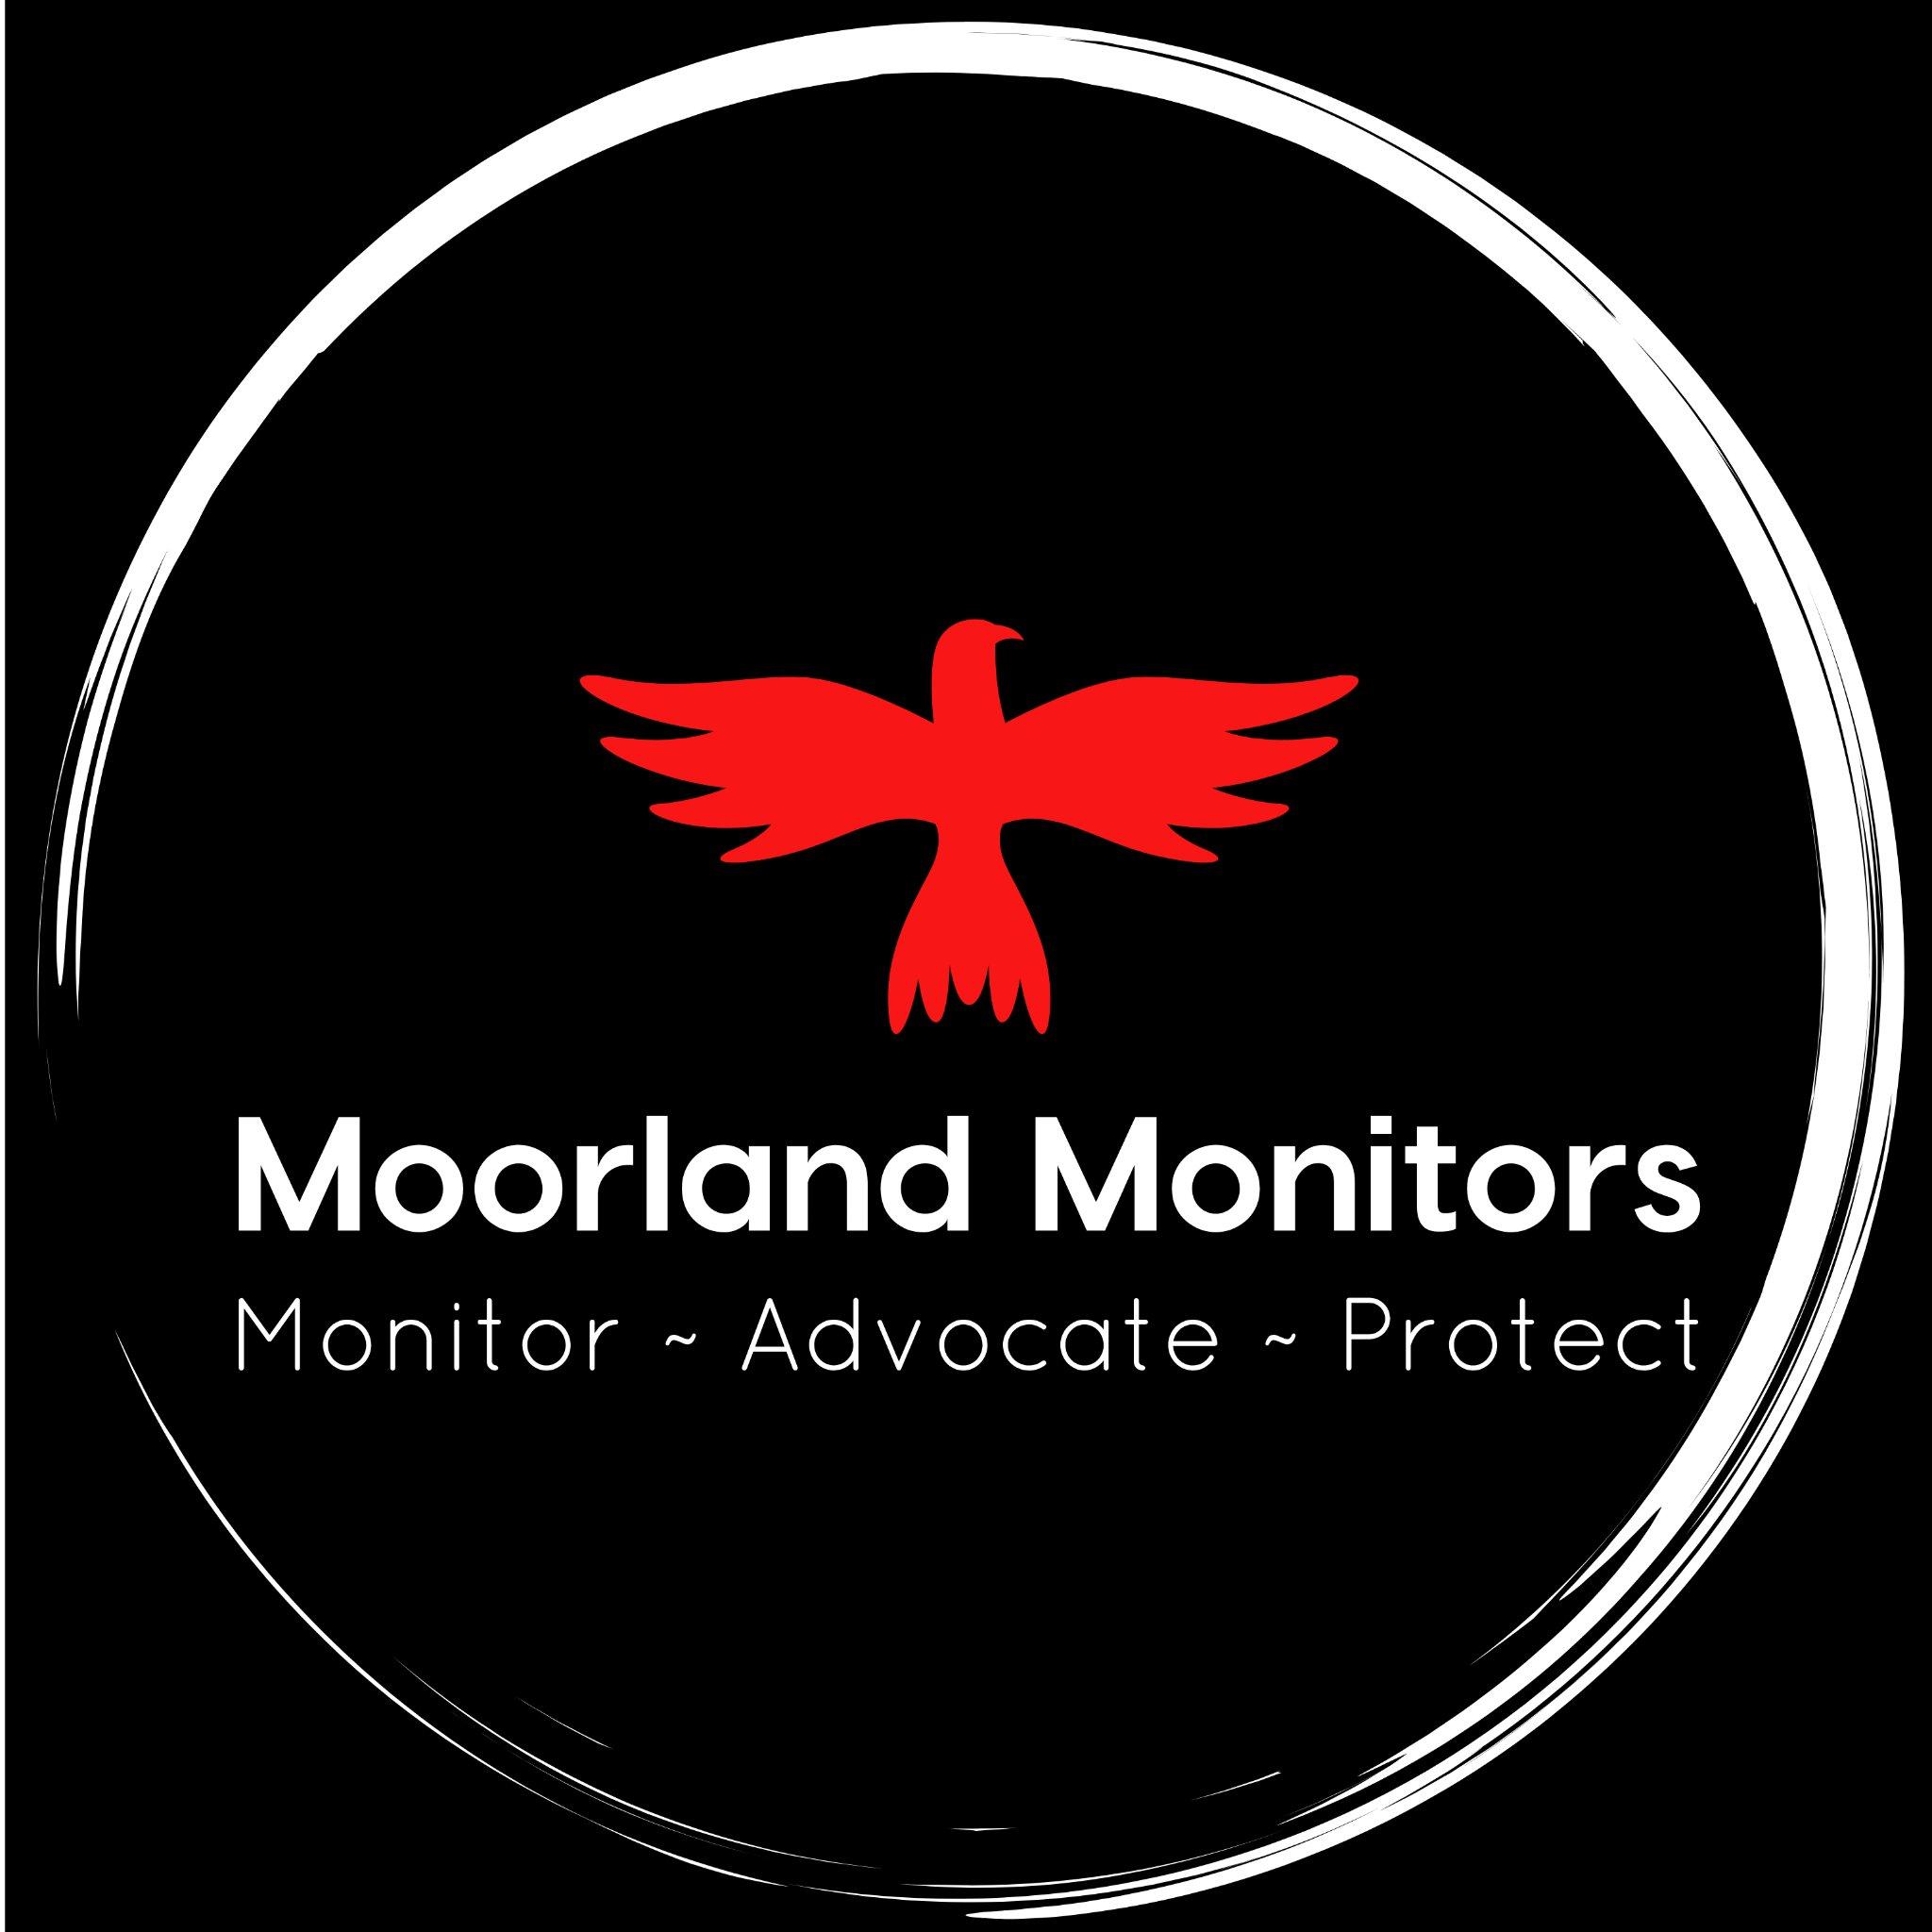 Moorland Monitors